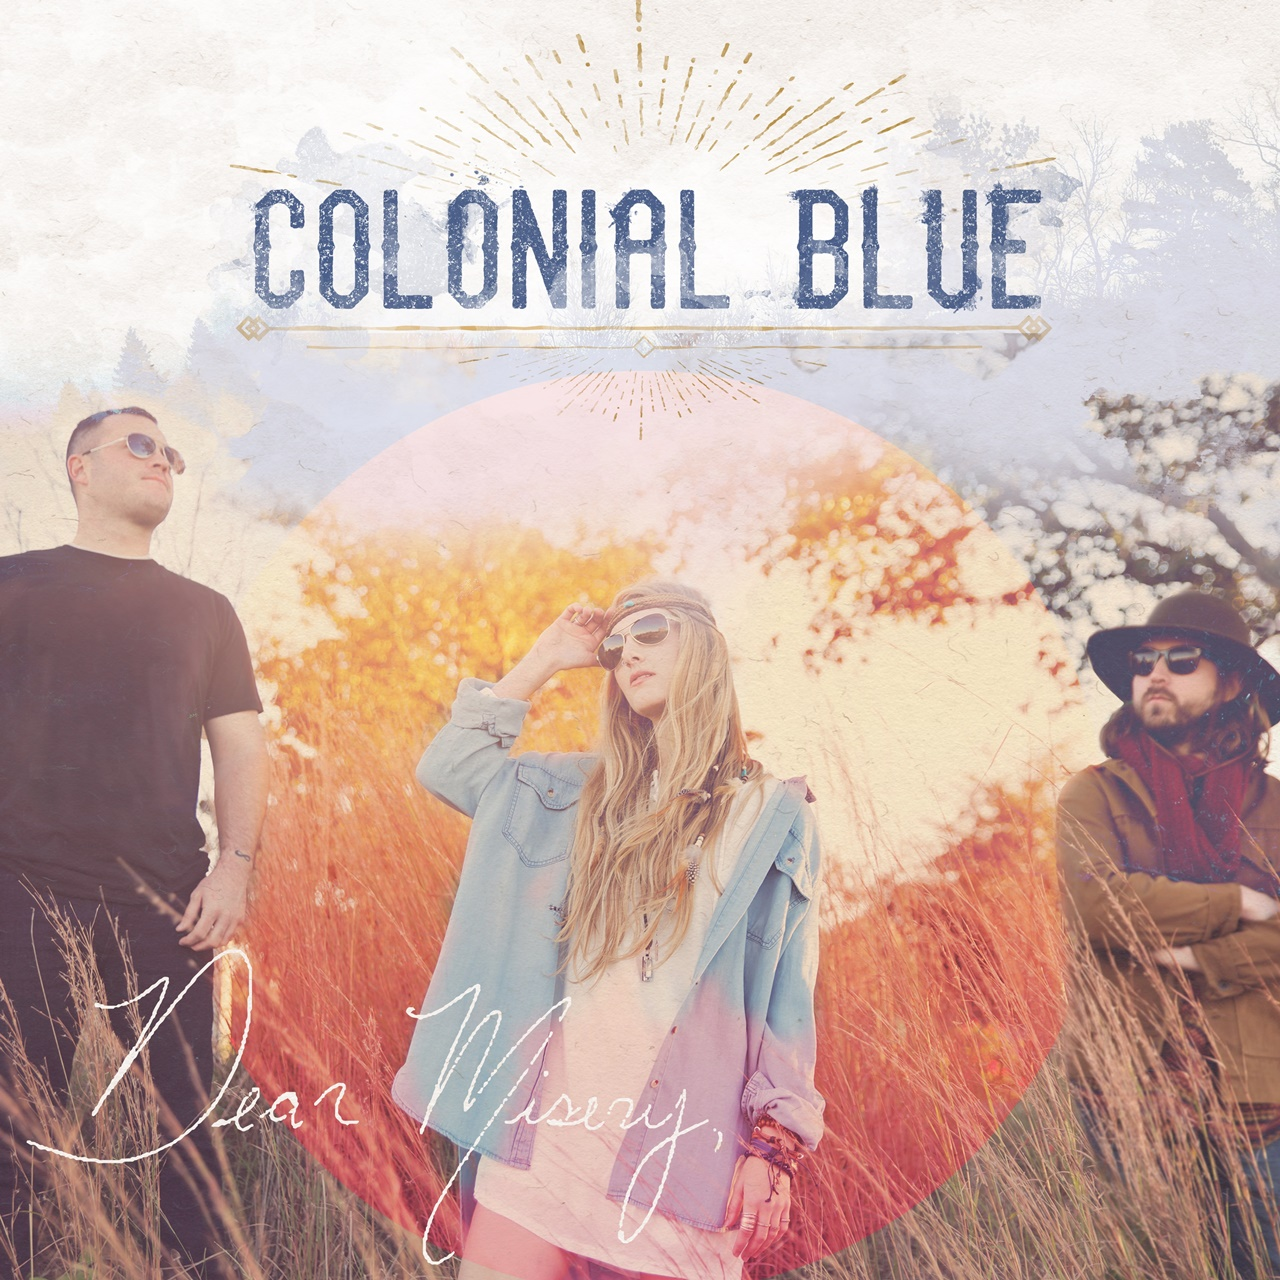 STREAM: Colonial Blue, 'Dear Misery,'